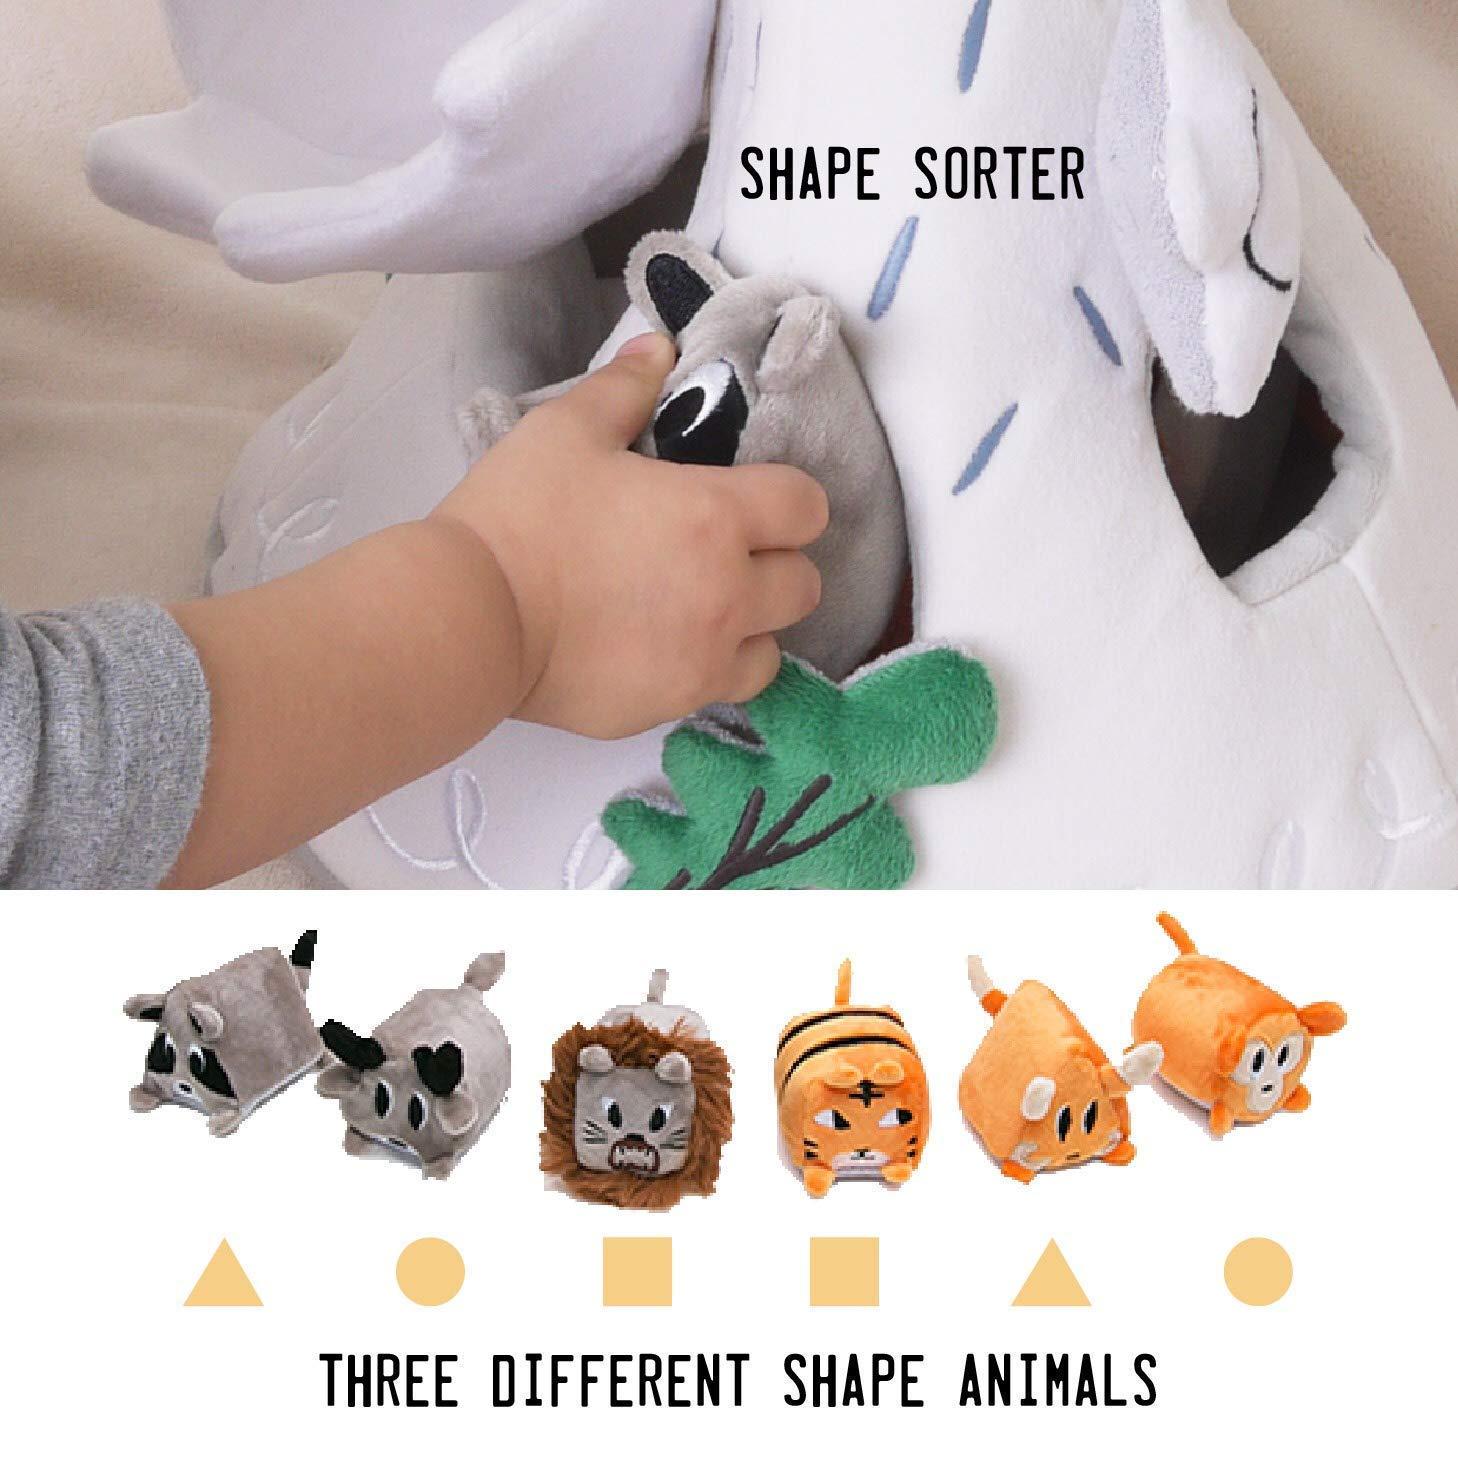 OK!DZO 12'' Mountain & Animal Shape Sorter Plush Developmental Toy Set (16 pcs)- Cognitive & Motor & Social Skills- Fun Bright Colors & Textures for Babies 0-36 Months by OK!DZO (Image #4)